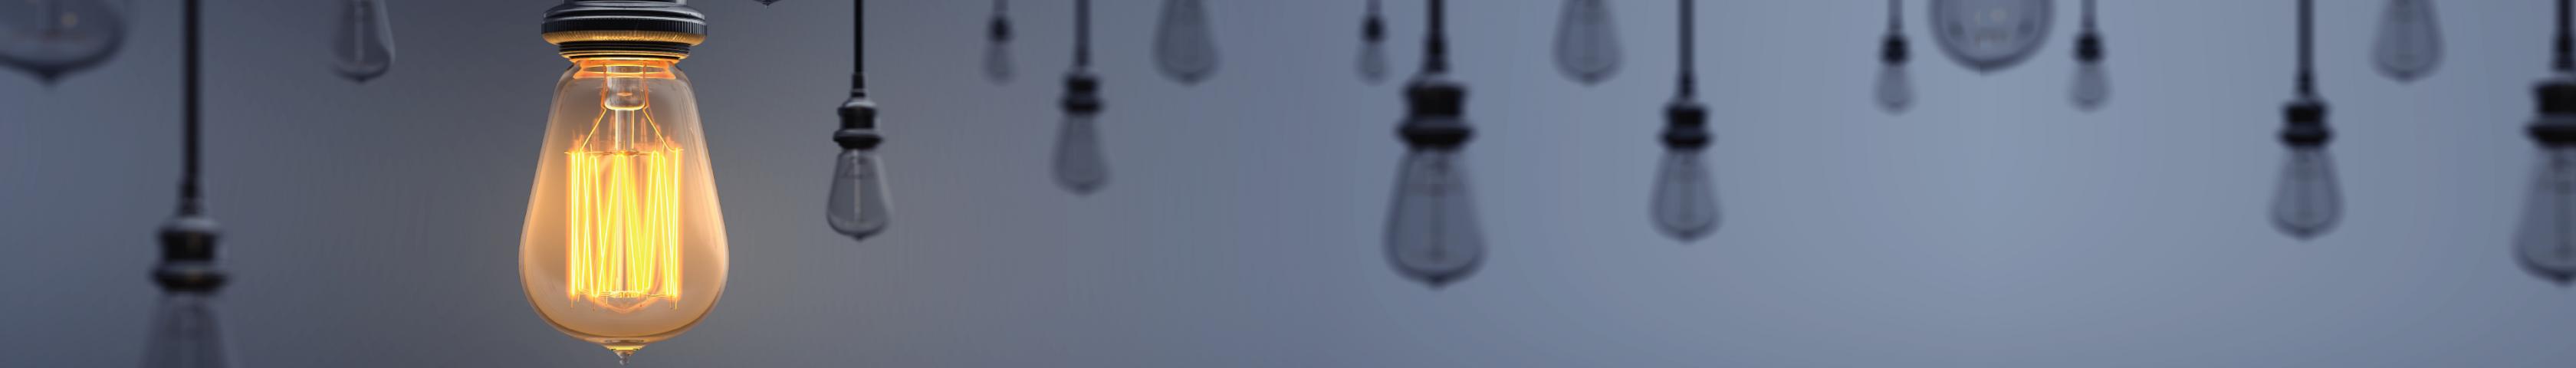 Light bulbs hanging with one illuminated